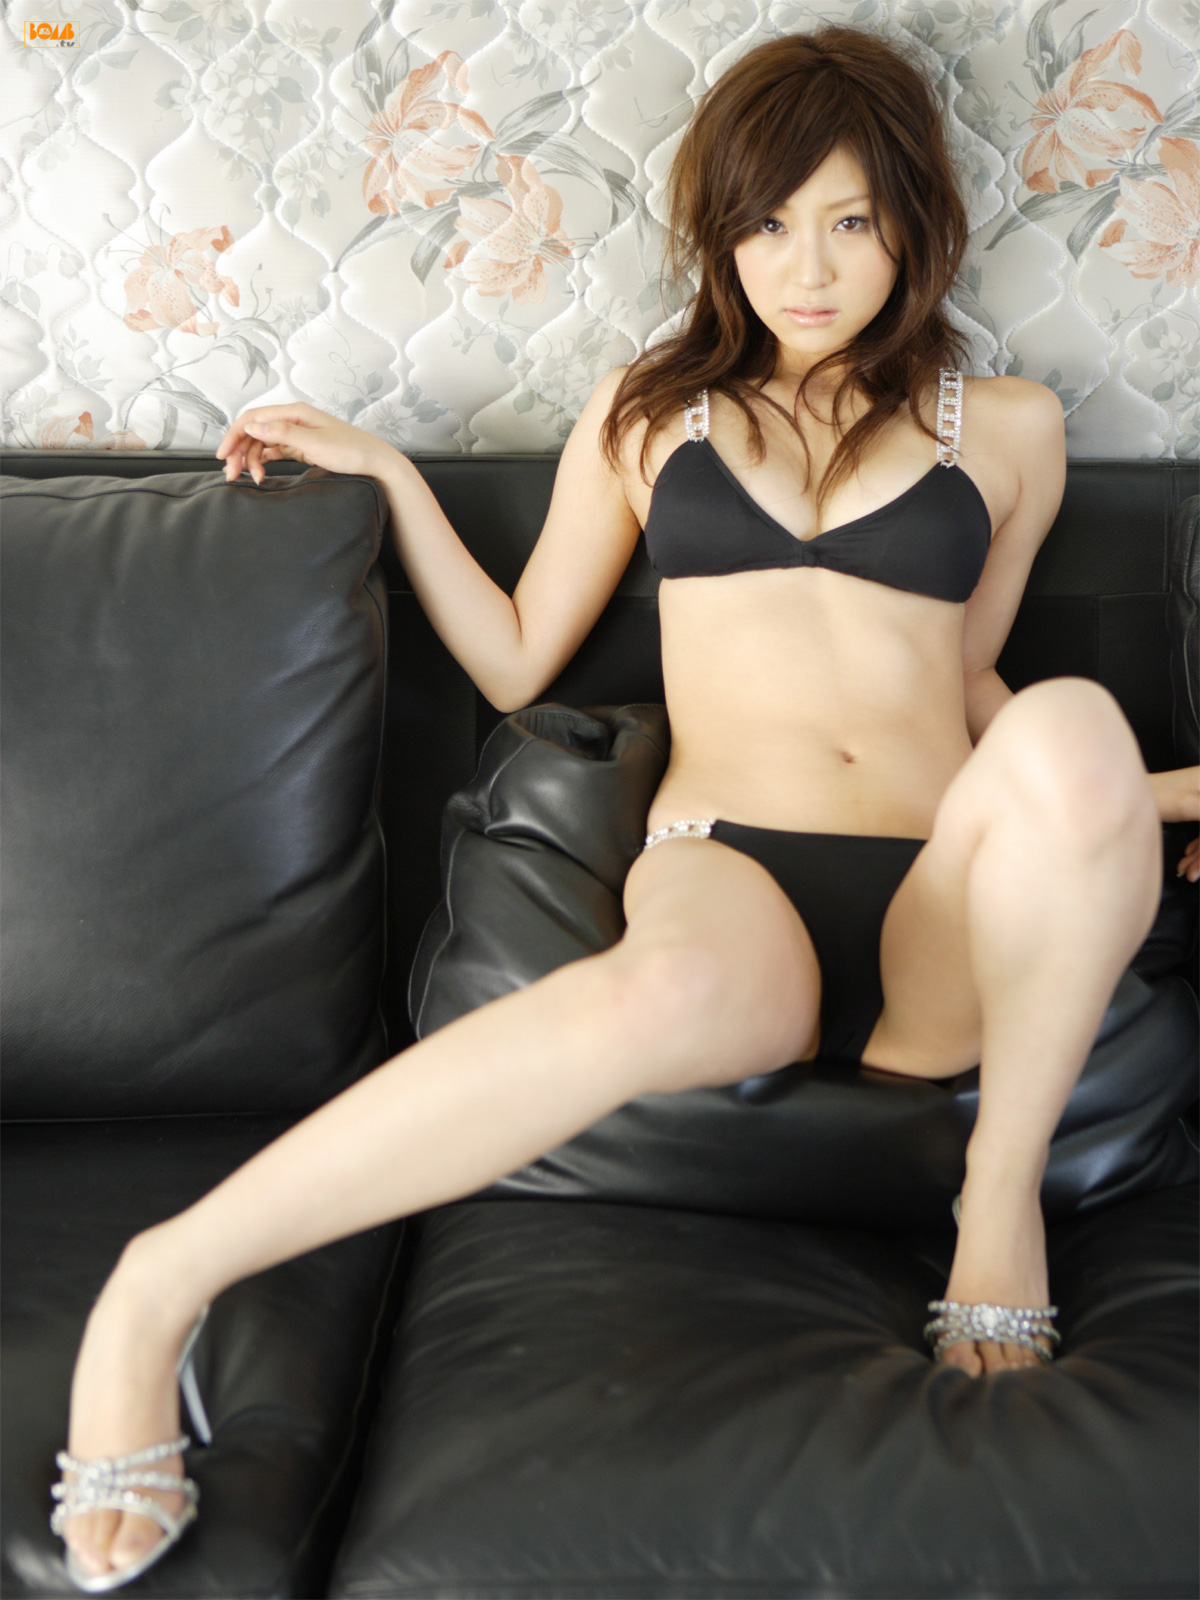 tn002-jpg [Bomb.tv] 2007.12 Natsuko Tatsumi 辰巳奈都子 [35P16MB] 09120